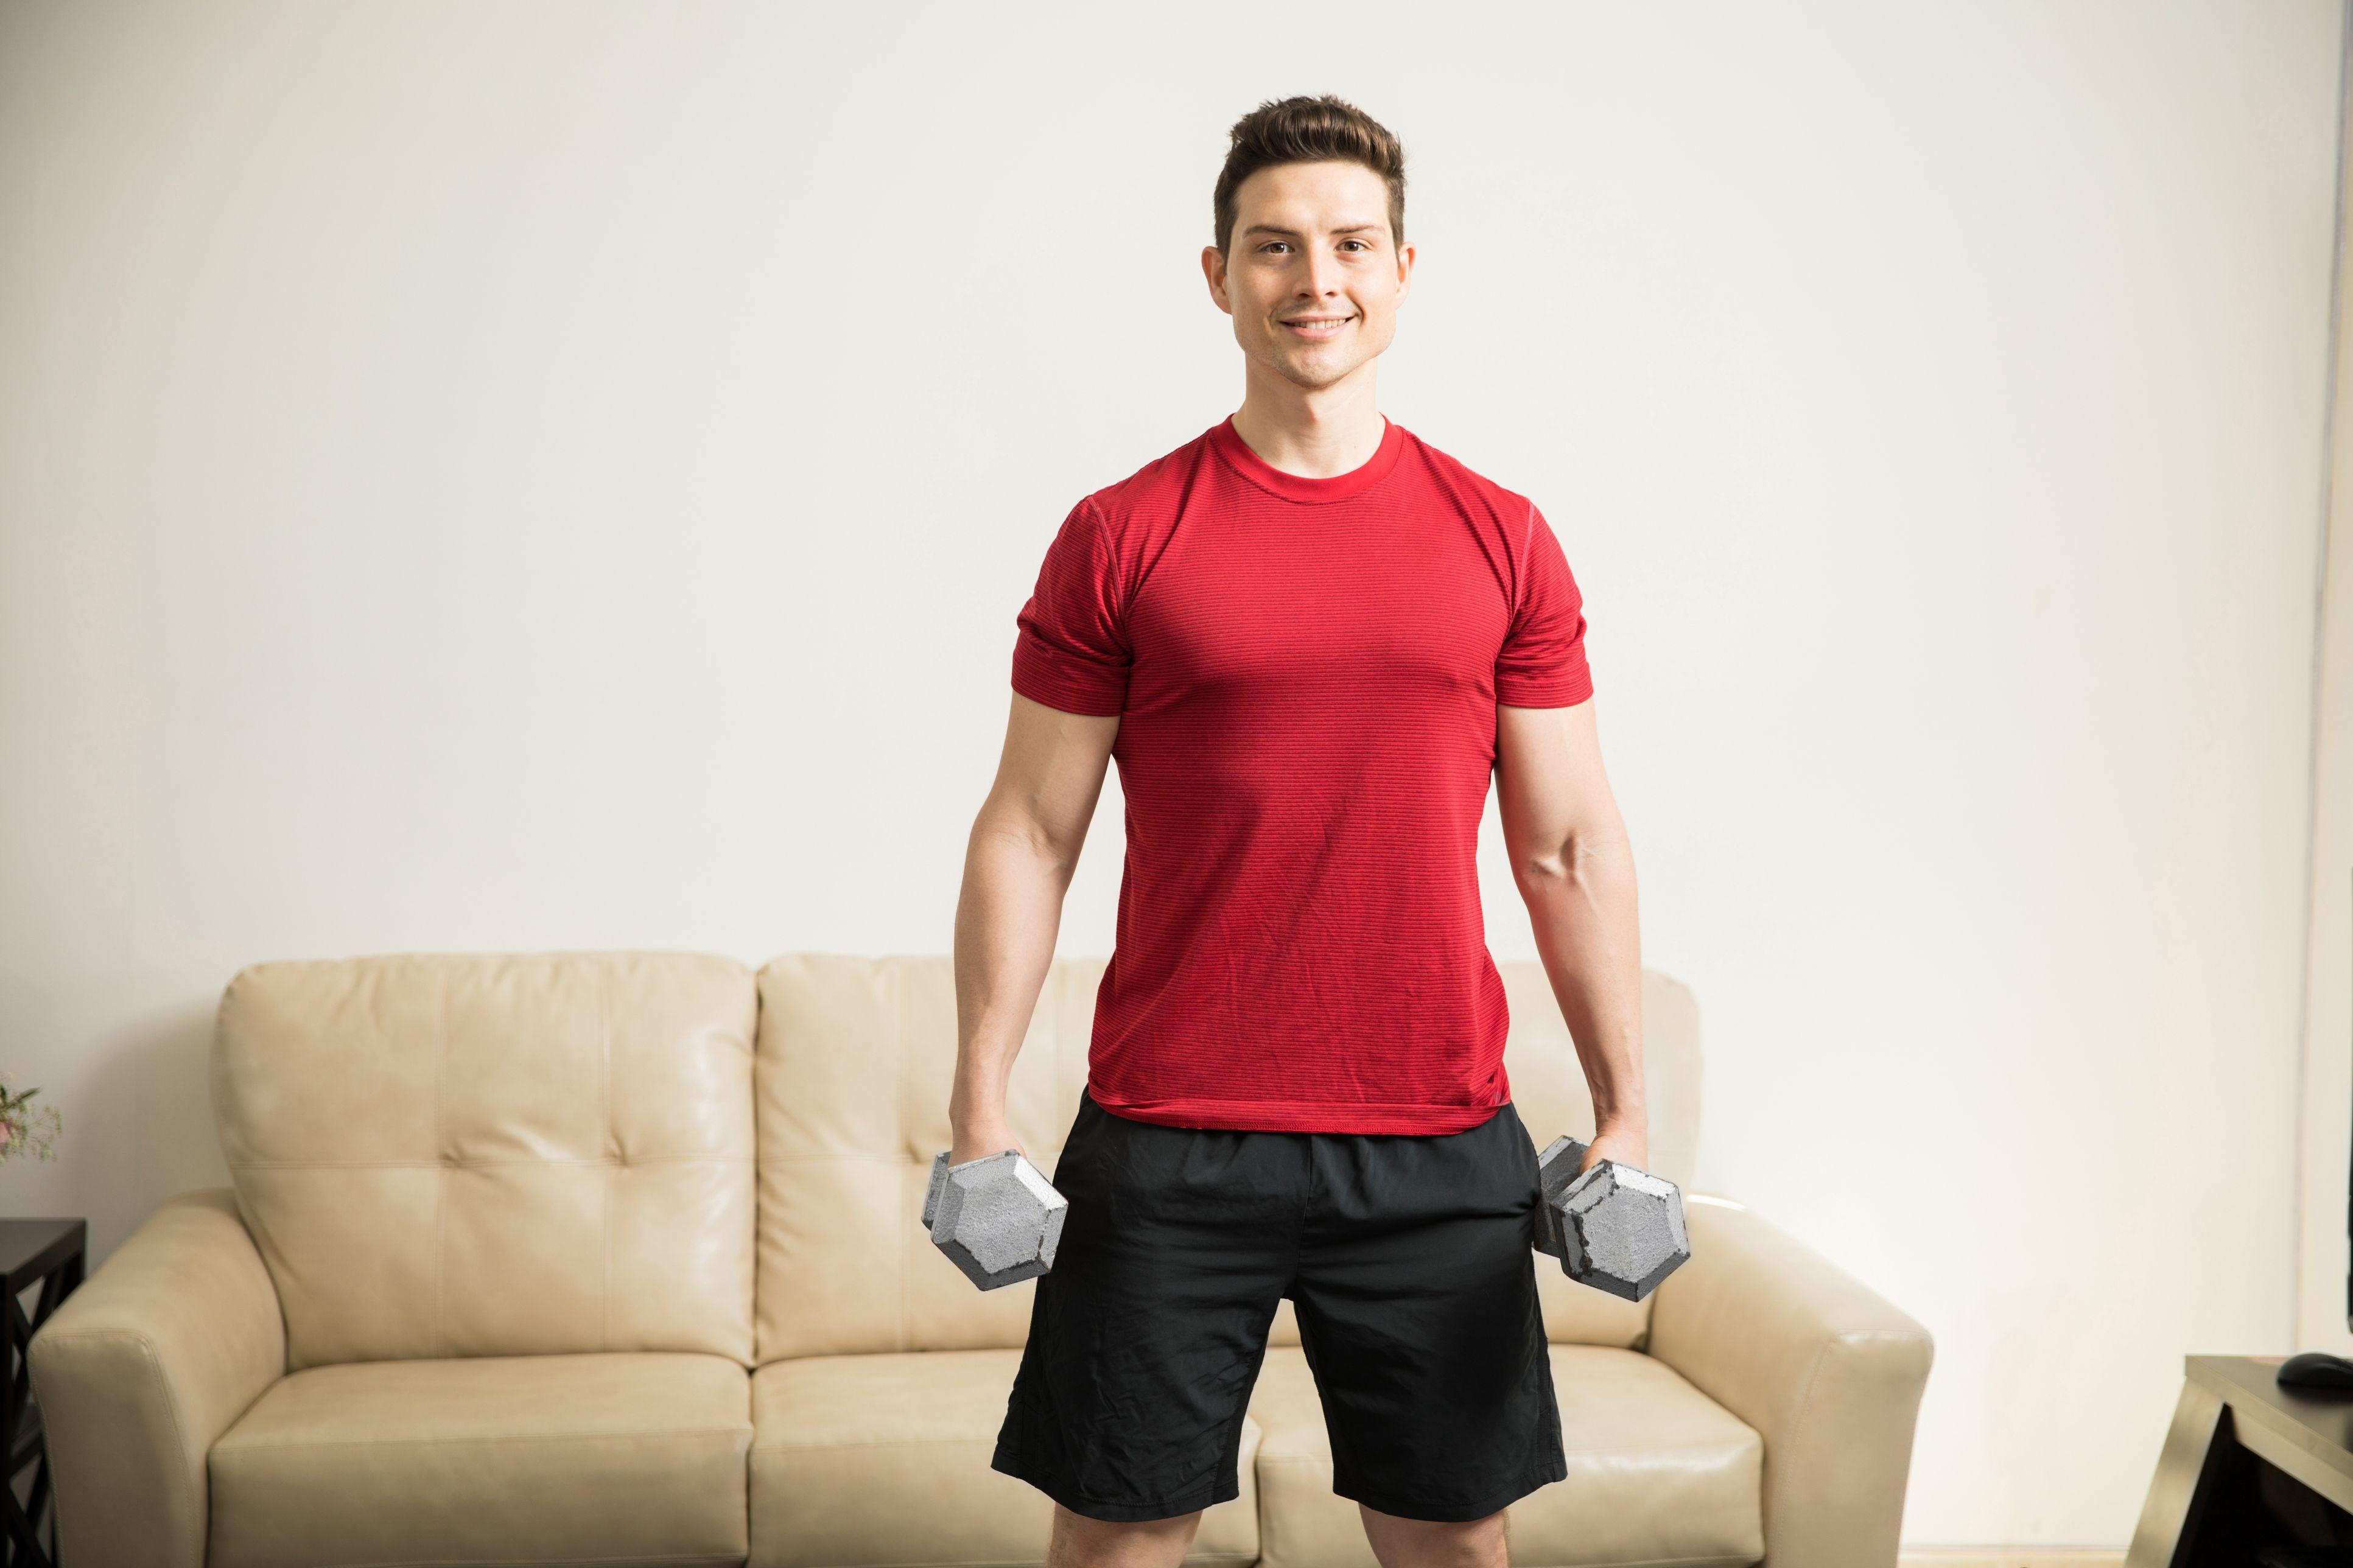 home dumbbell workout-tap ta tai nha-elleman-0120-